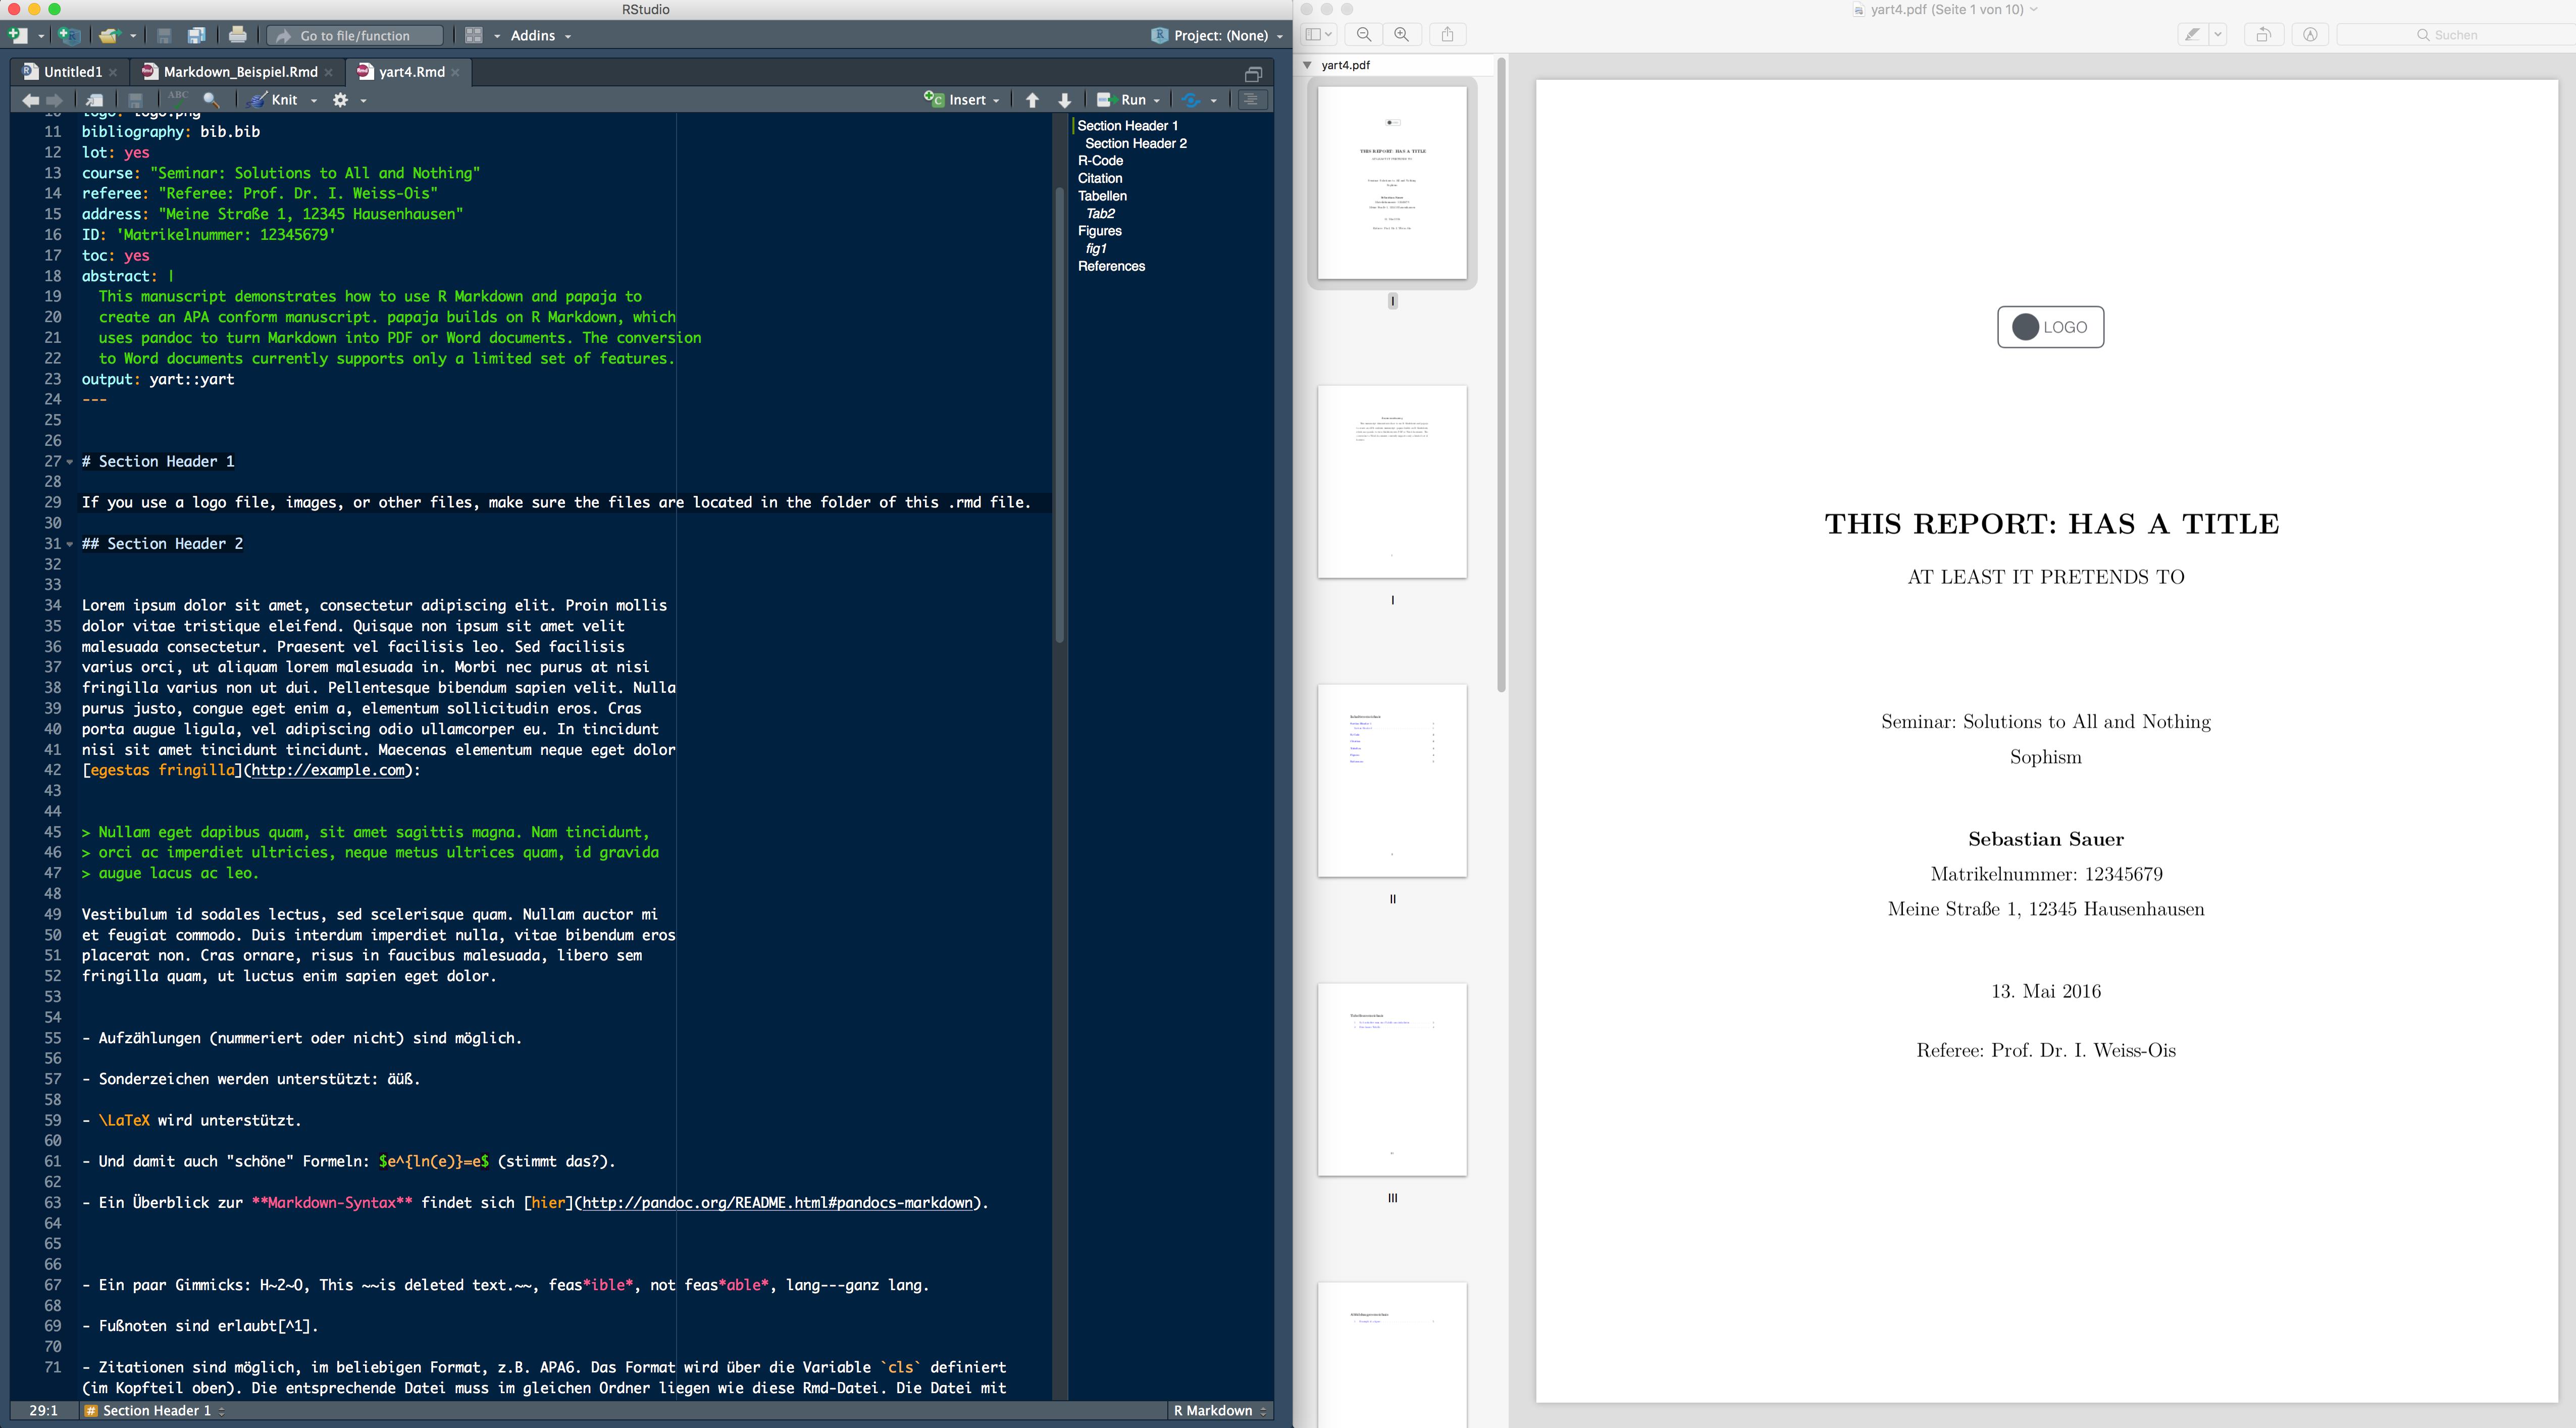 GitHub - sebastiansauer/yart: RMarkdown Template for writing PDF reports